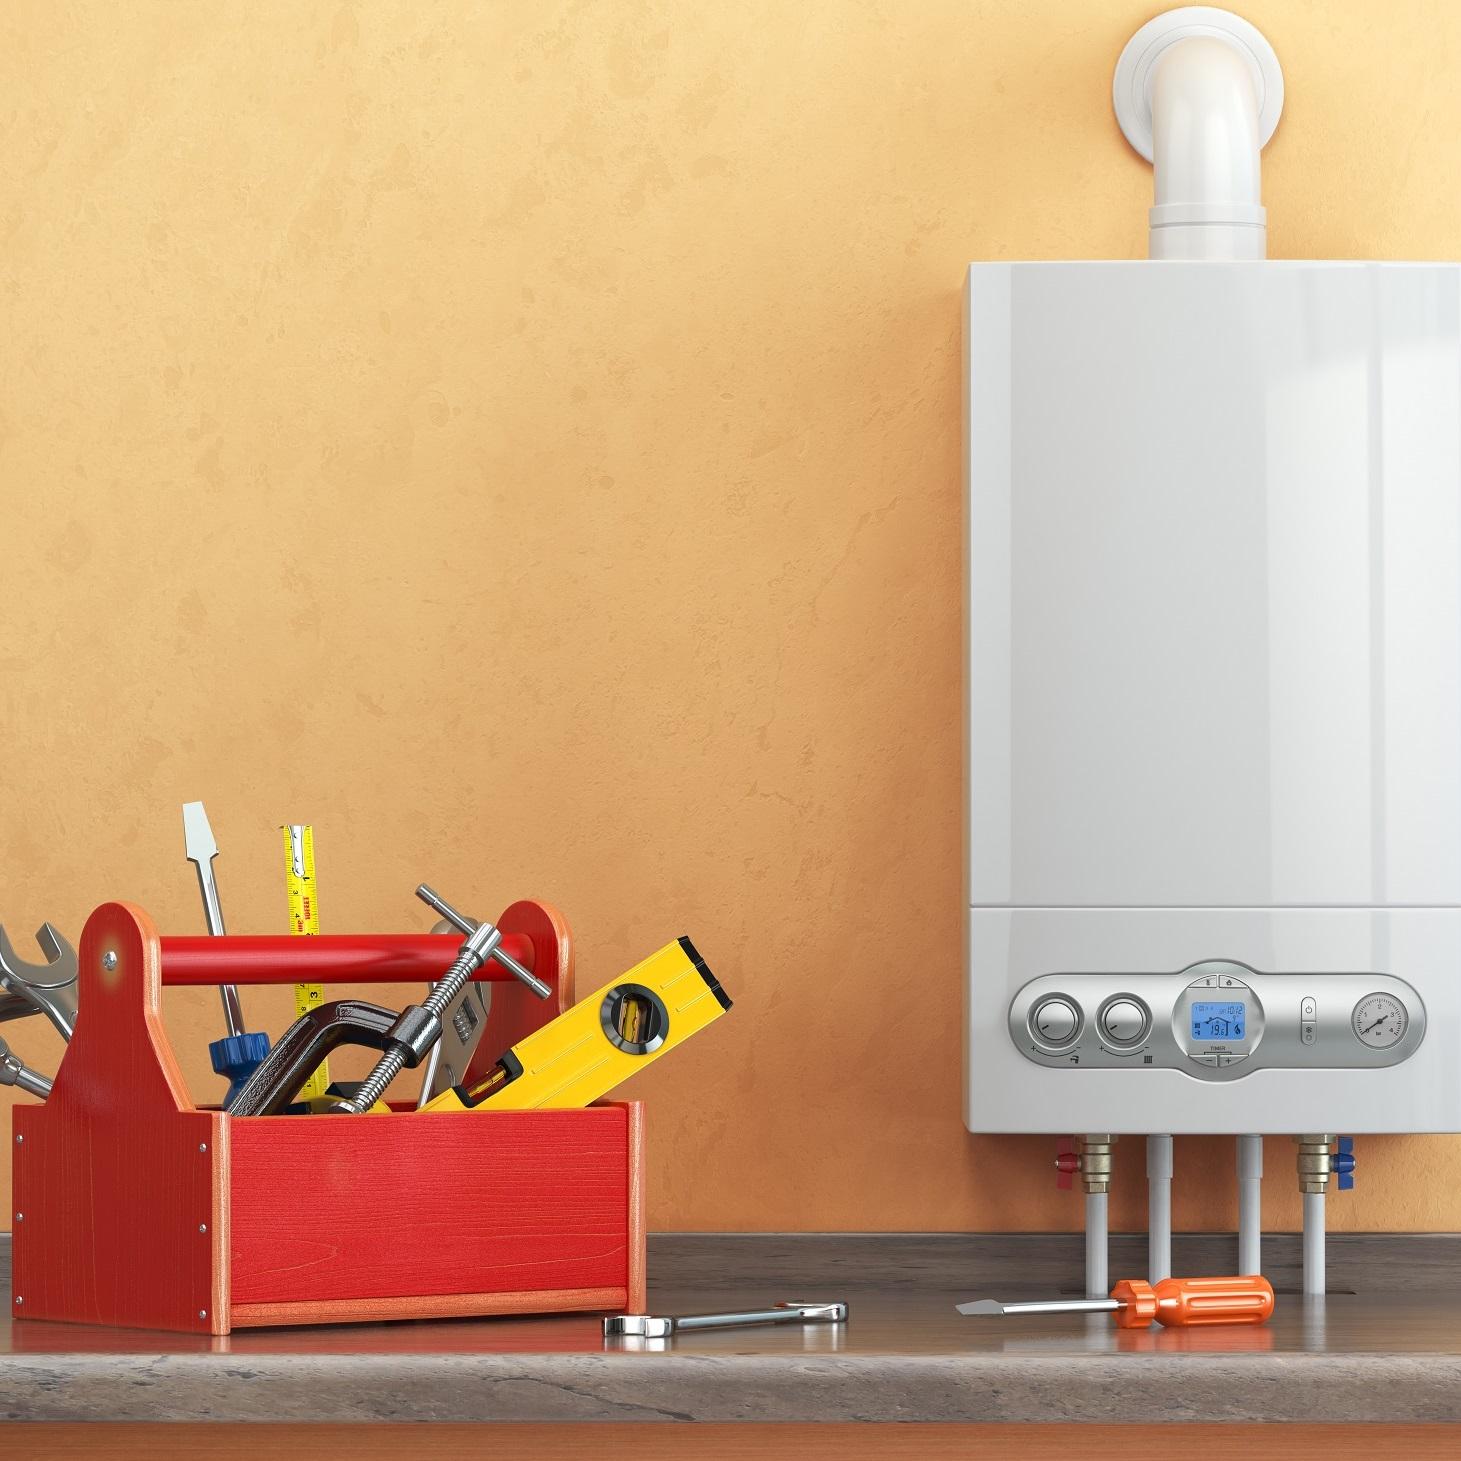 Summer Boiler Service